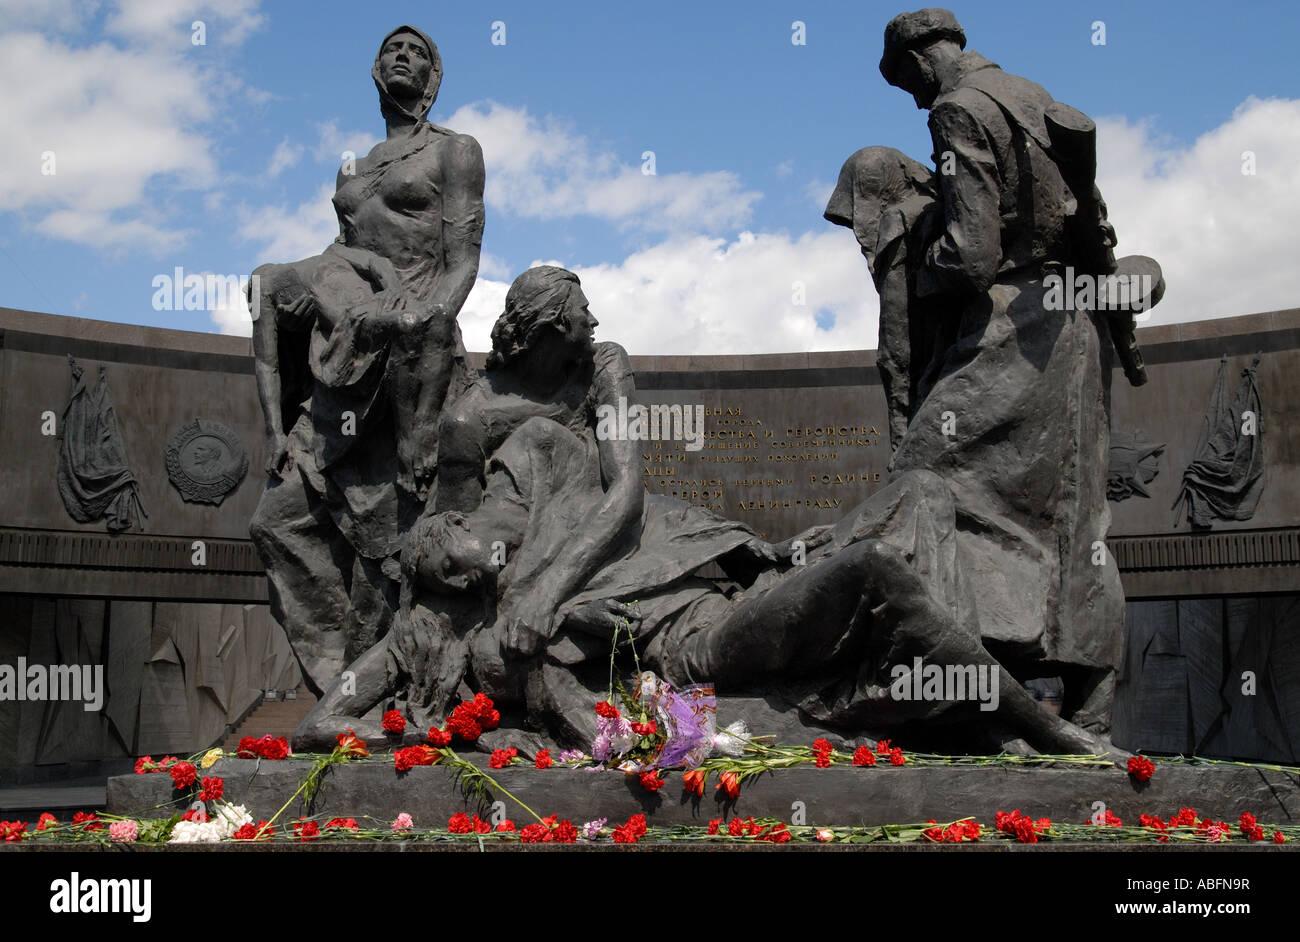 Memorial to the defenders of Leningrad, St Petersburg - Stock Image